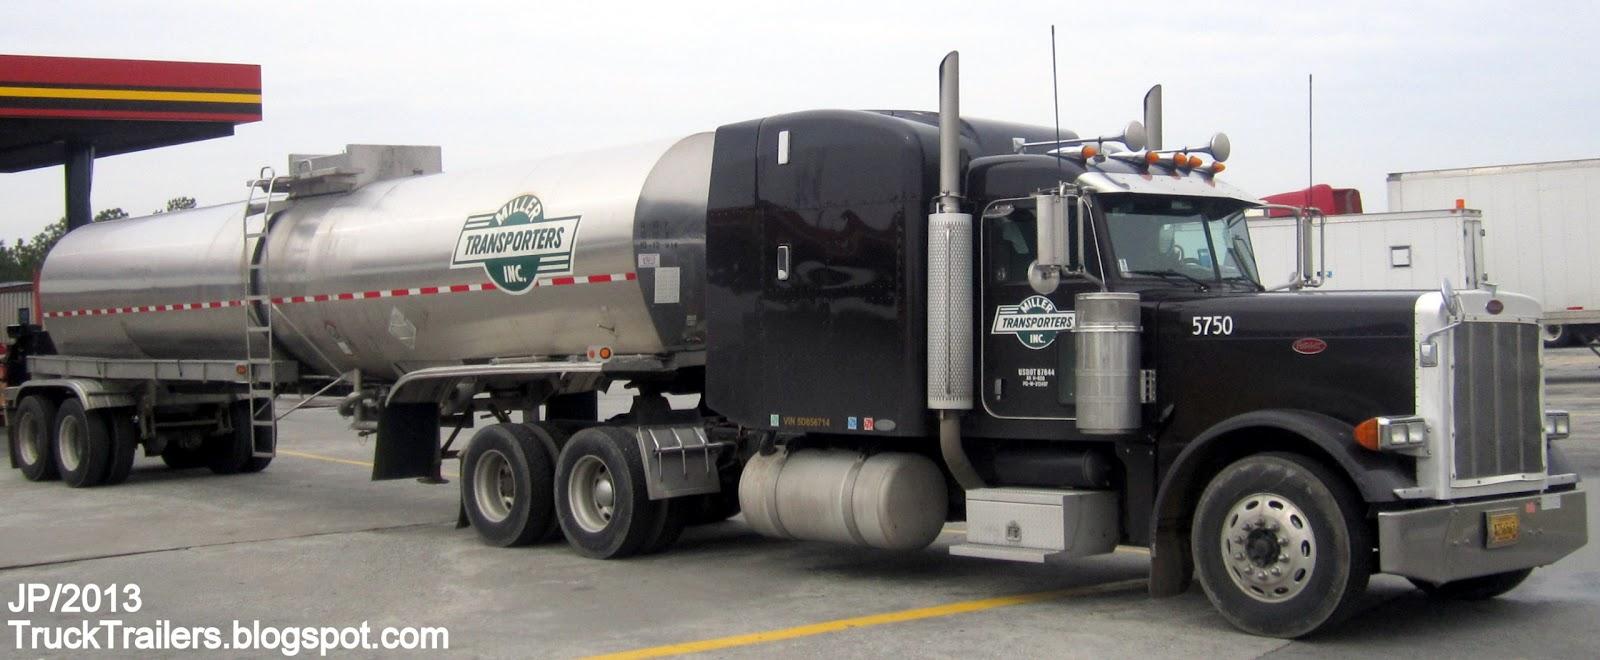 Miller transporters inc peterbilt sleeper cab truck stainless steel tank trailer bulk commodity miller transport trucking company jackson ms